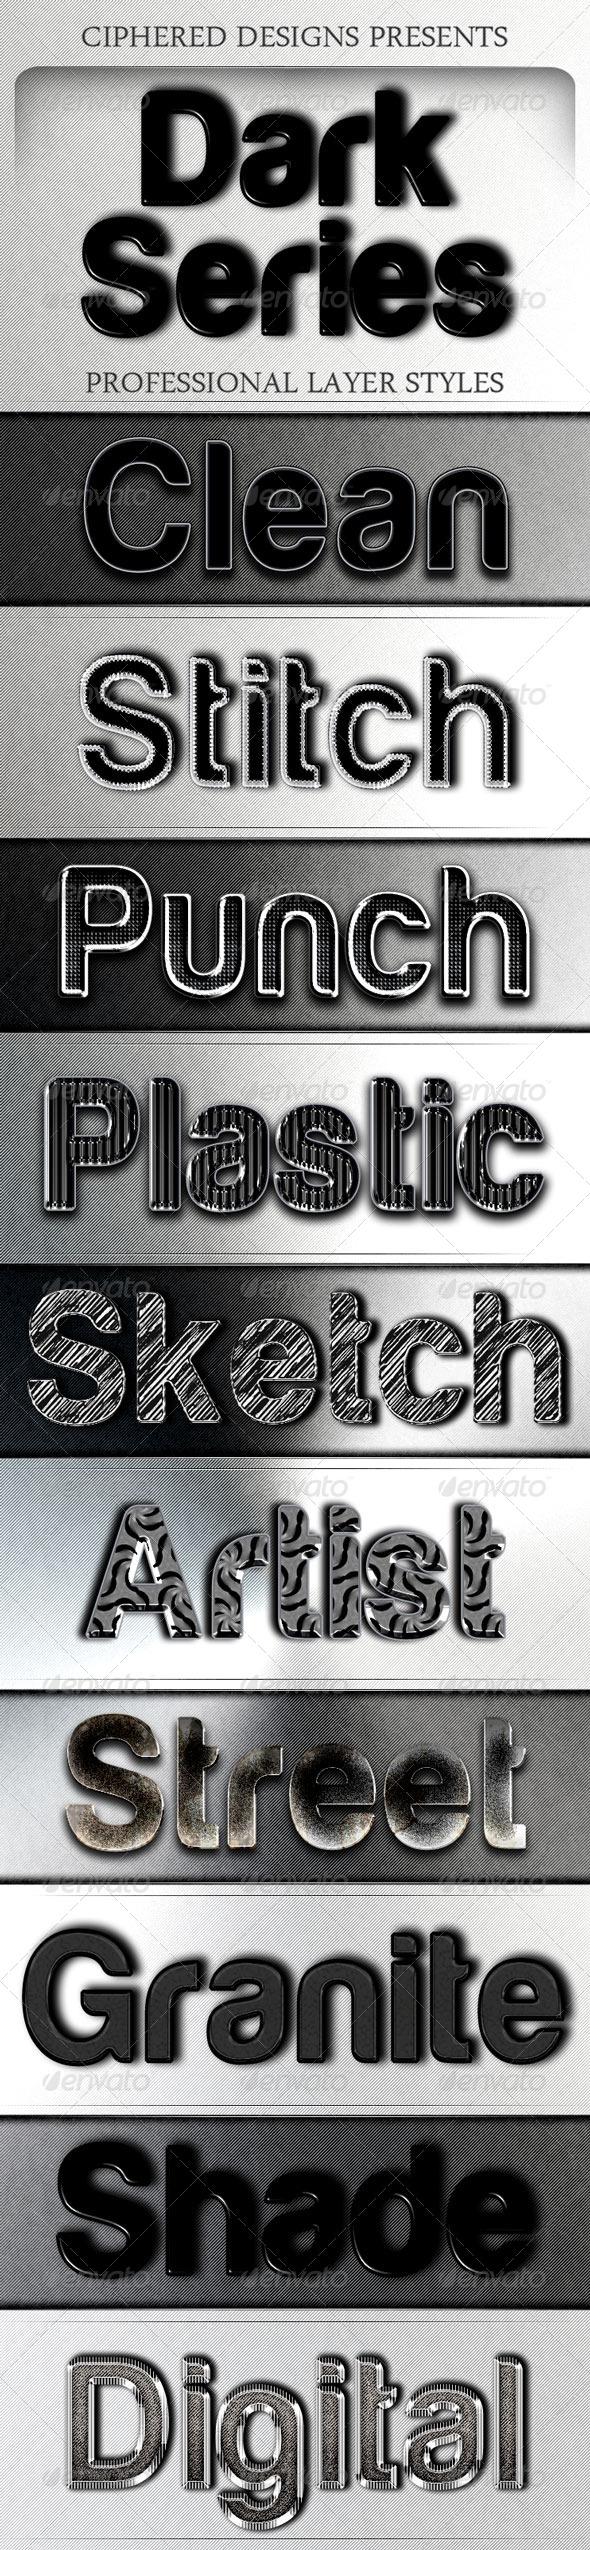 GraphicRiver Dark Series Professional Layer Styles 4126034